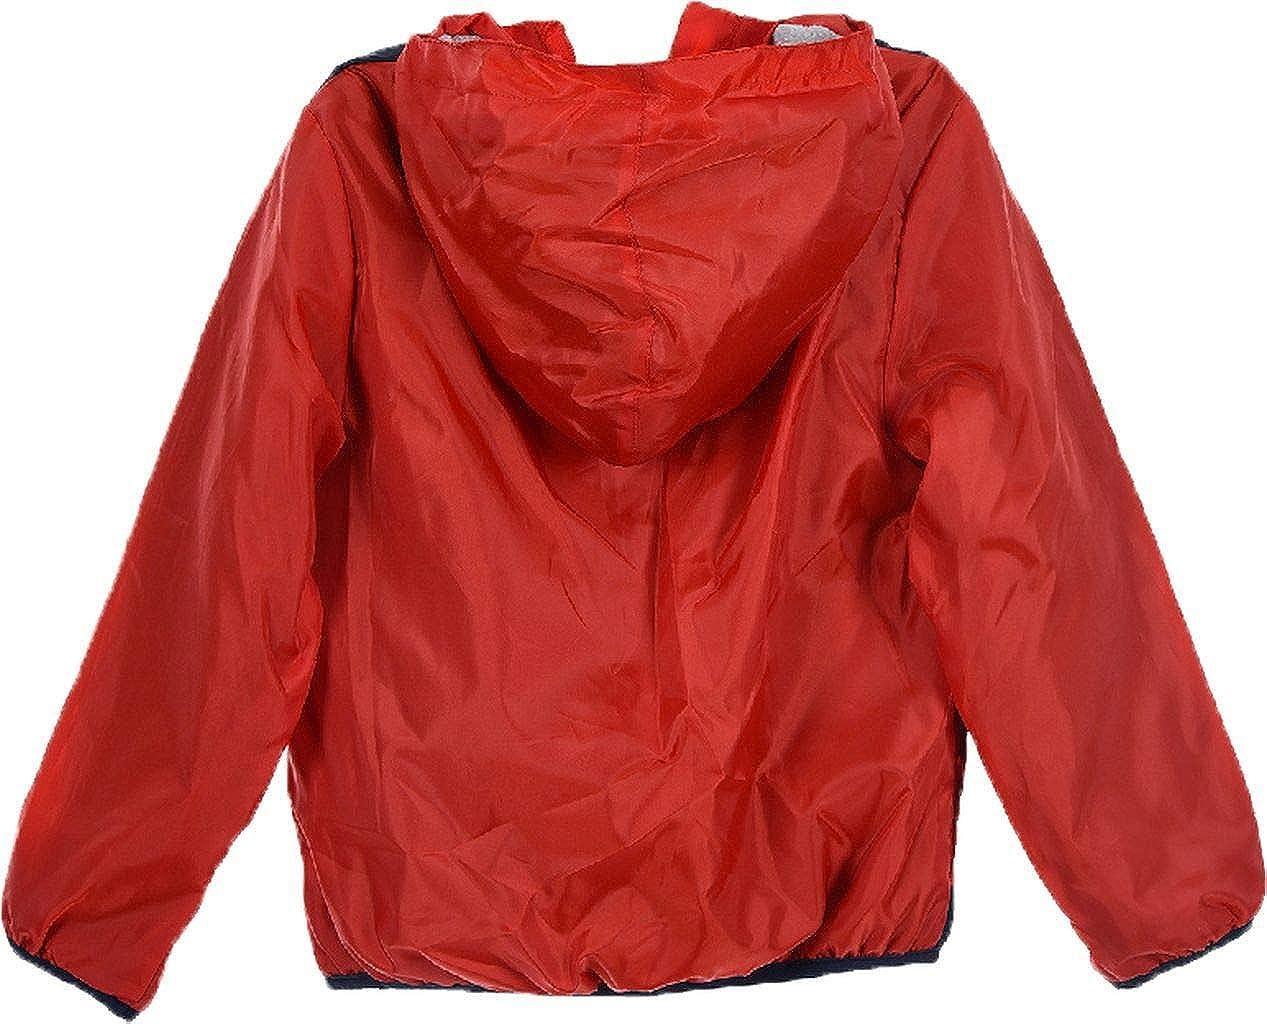 Paw Patrol Nickelodeon Chase Marshall Characters Boys Zipped Rain Jacket Coat Lightweight Stripes Pattern 2-8 Years